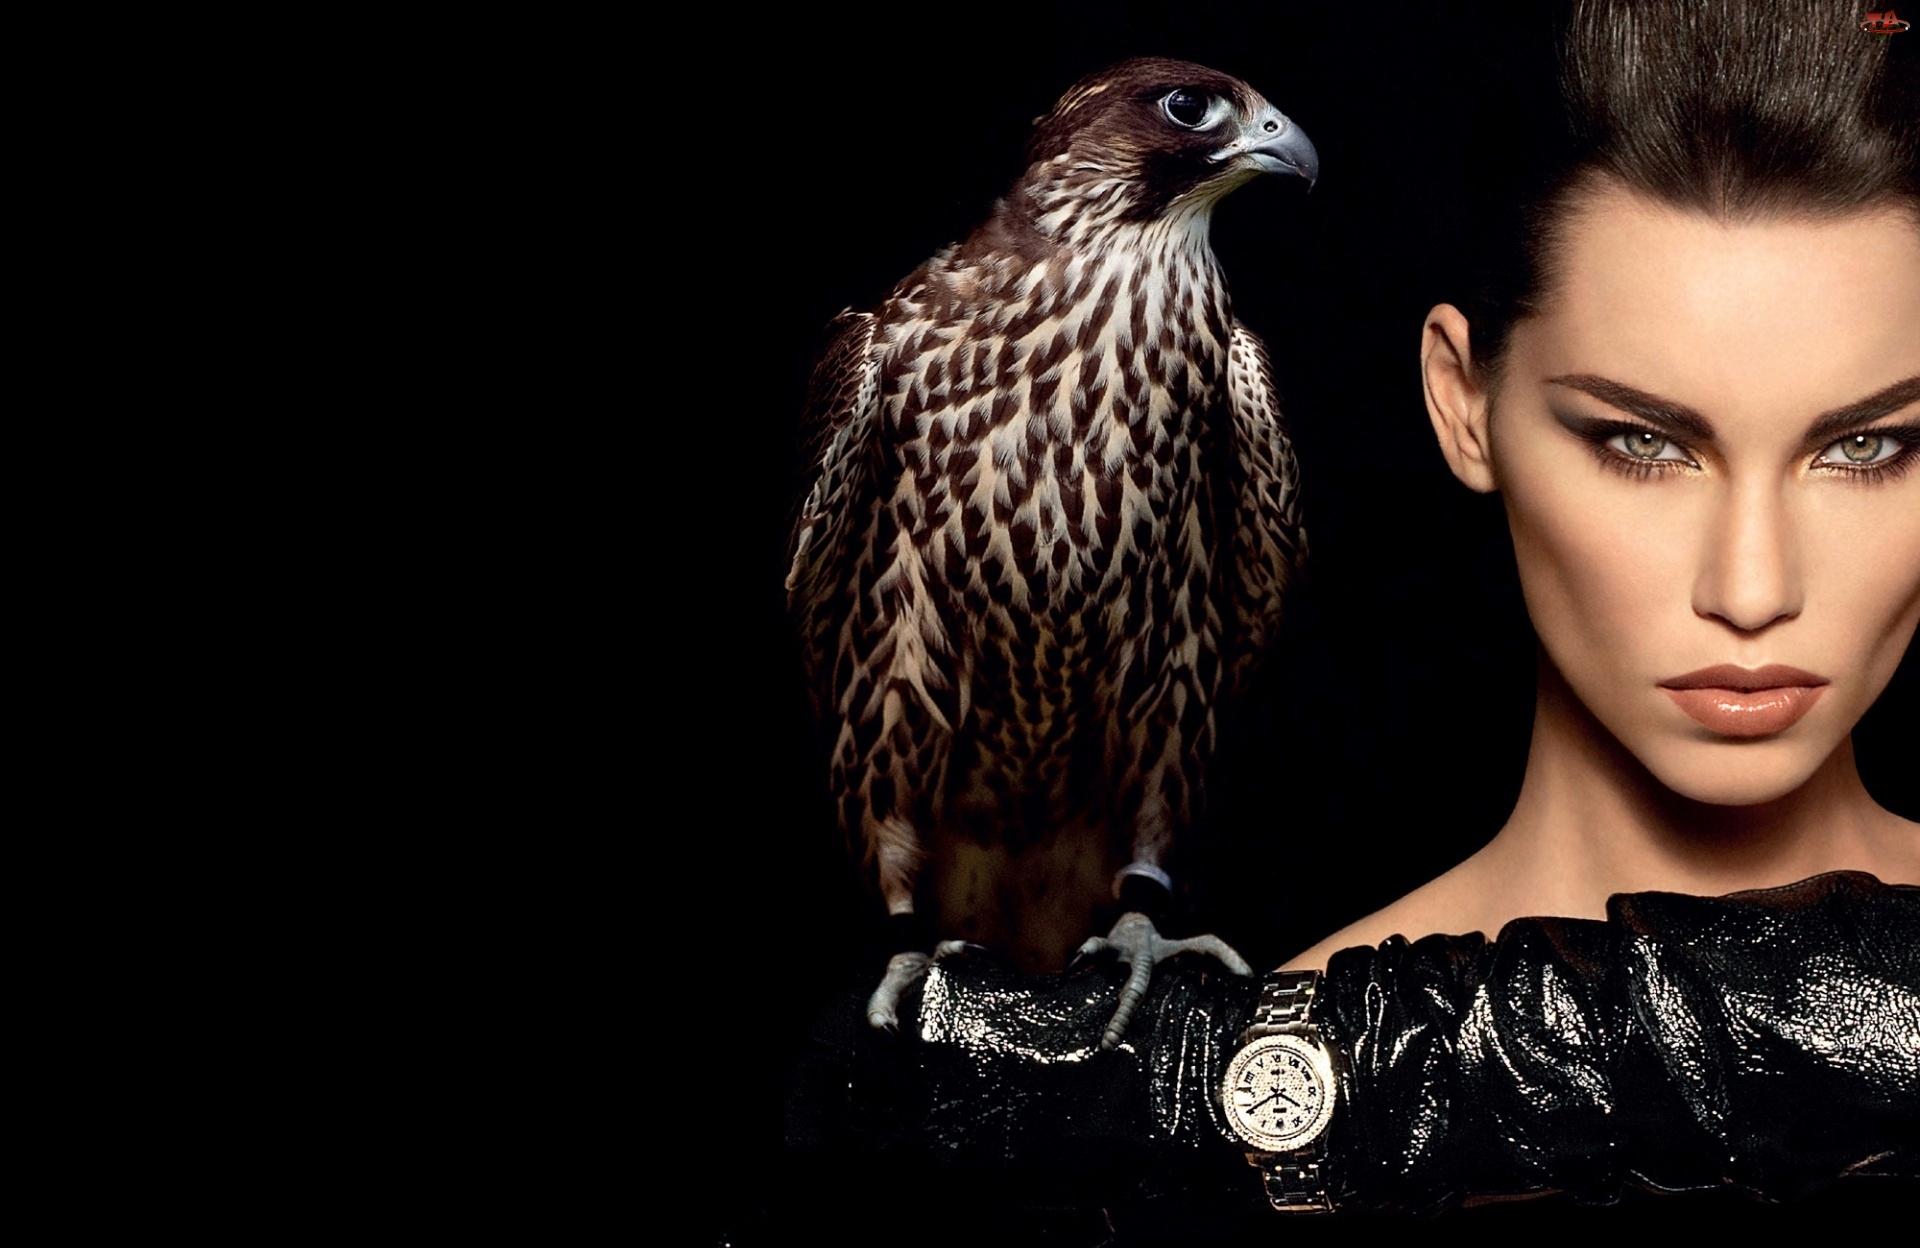 Zegarek, Kobieta, Jastrząb